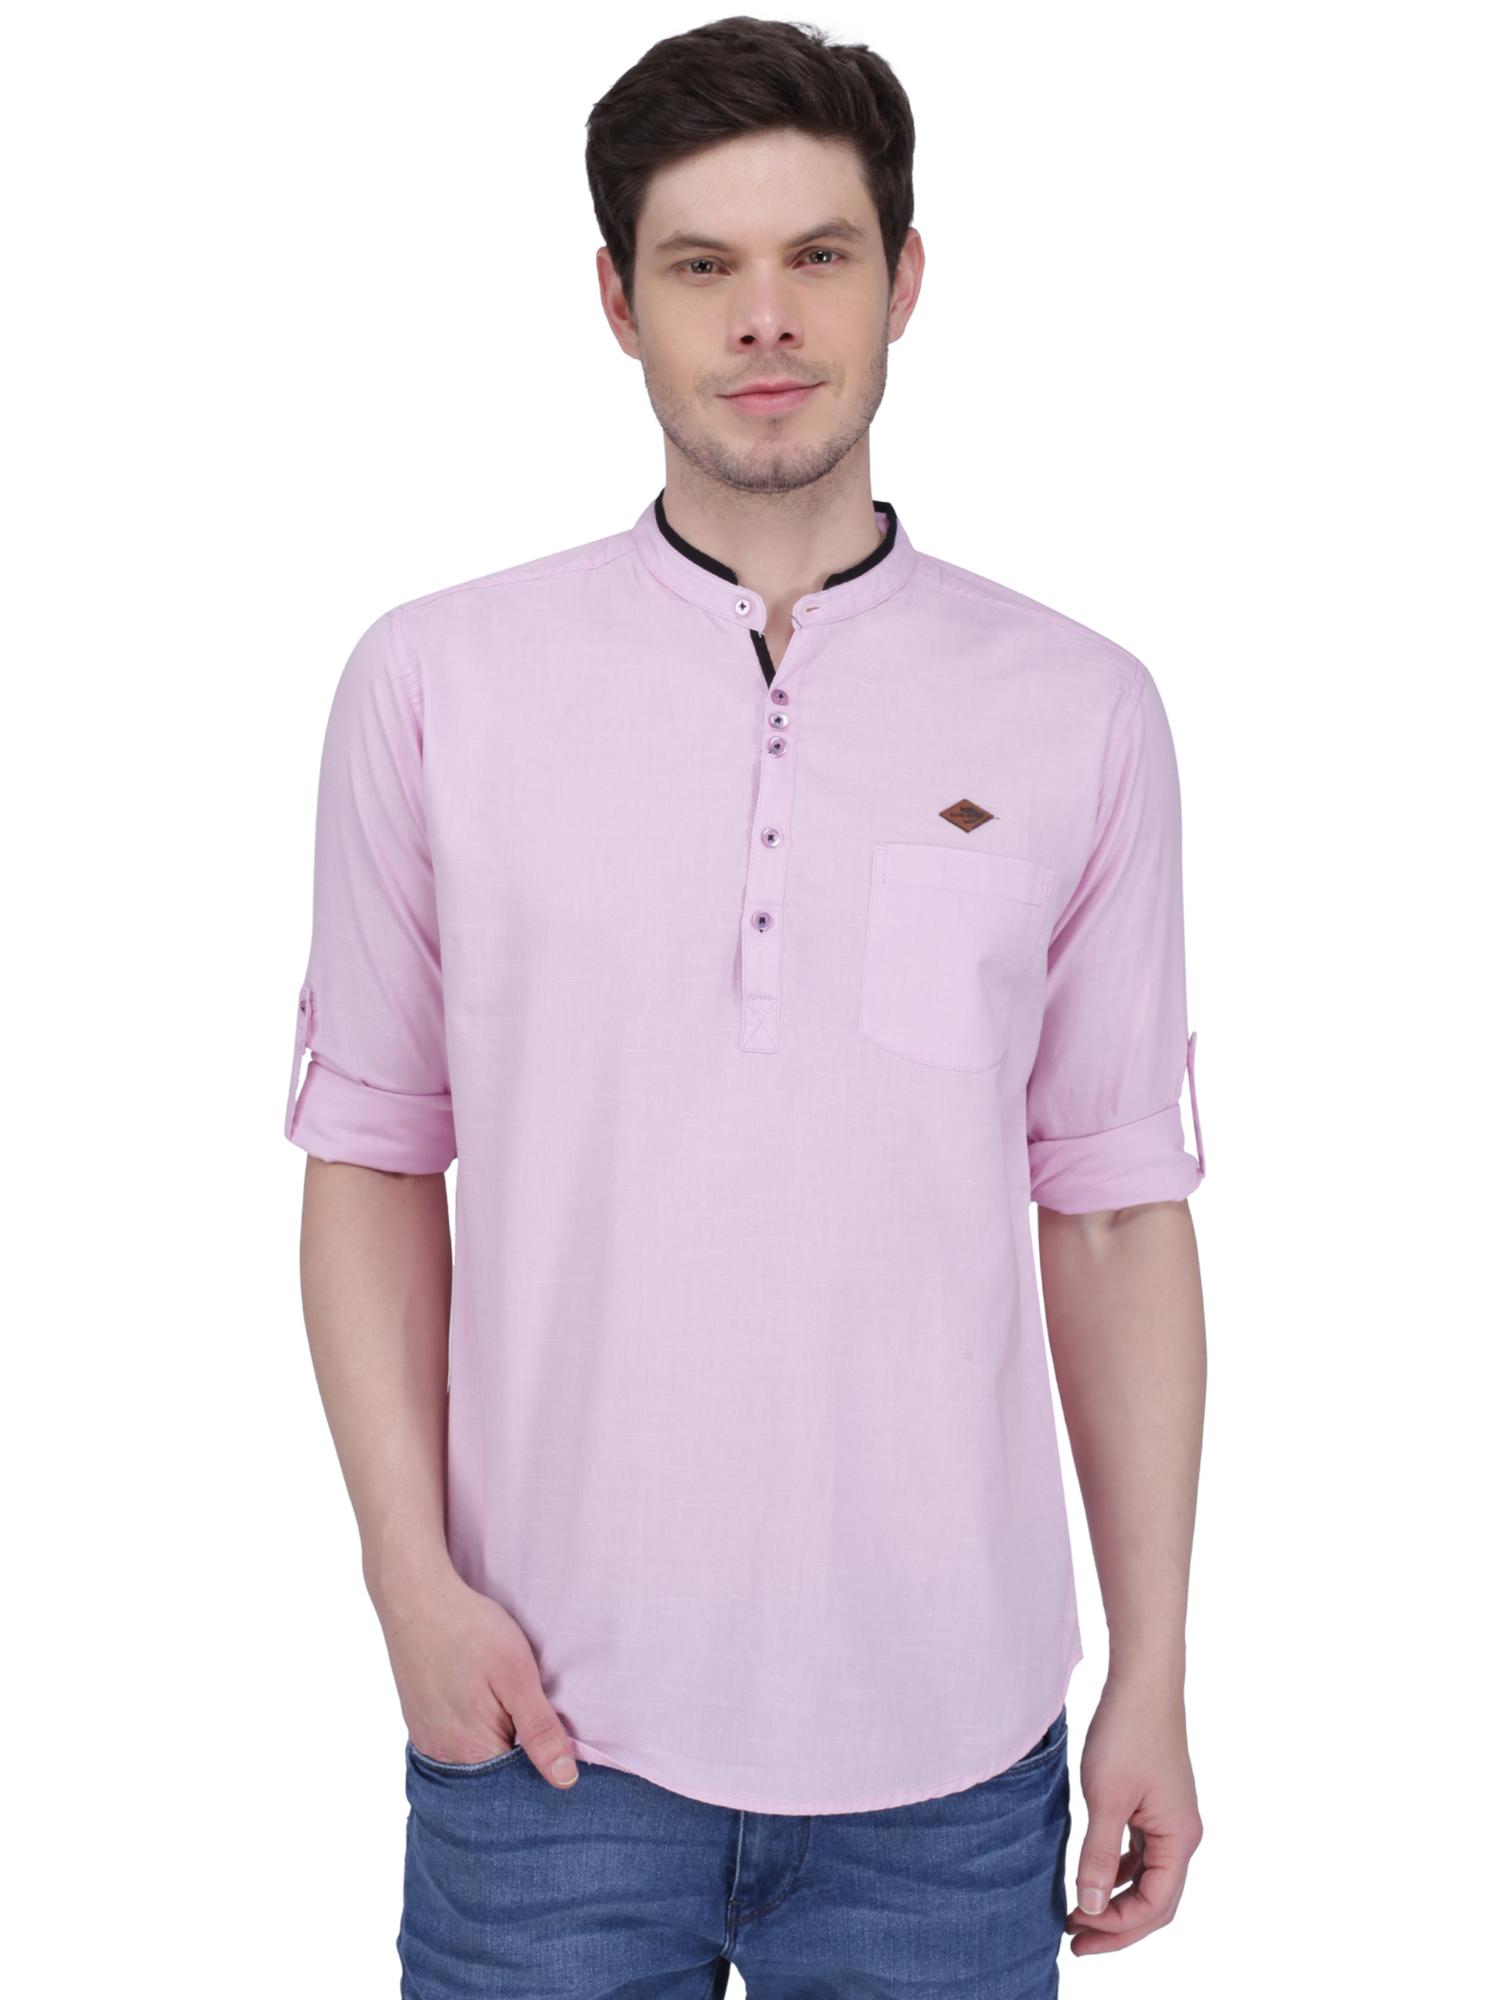 Kuons Avenue | Kuons Avenue Men's Baby Pink Linen Cotton Short Kurta- KACLFS1315PK